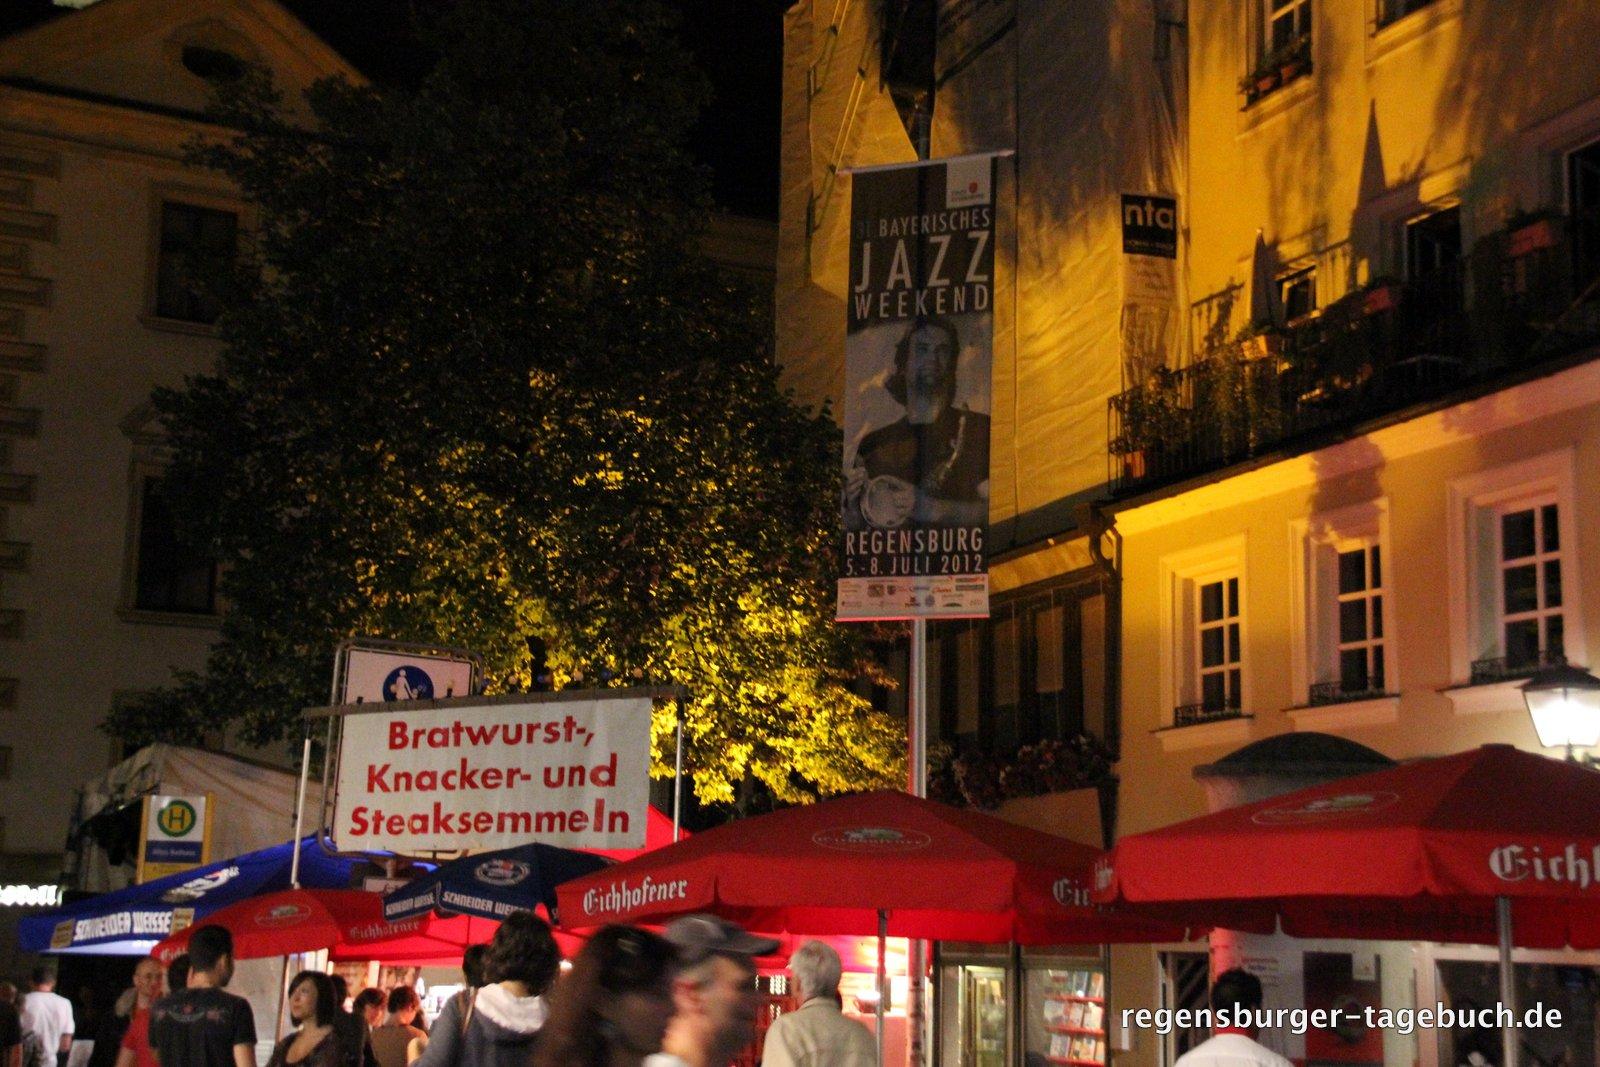 Jazzweekend Regensburg Programm